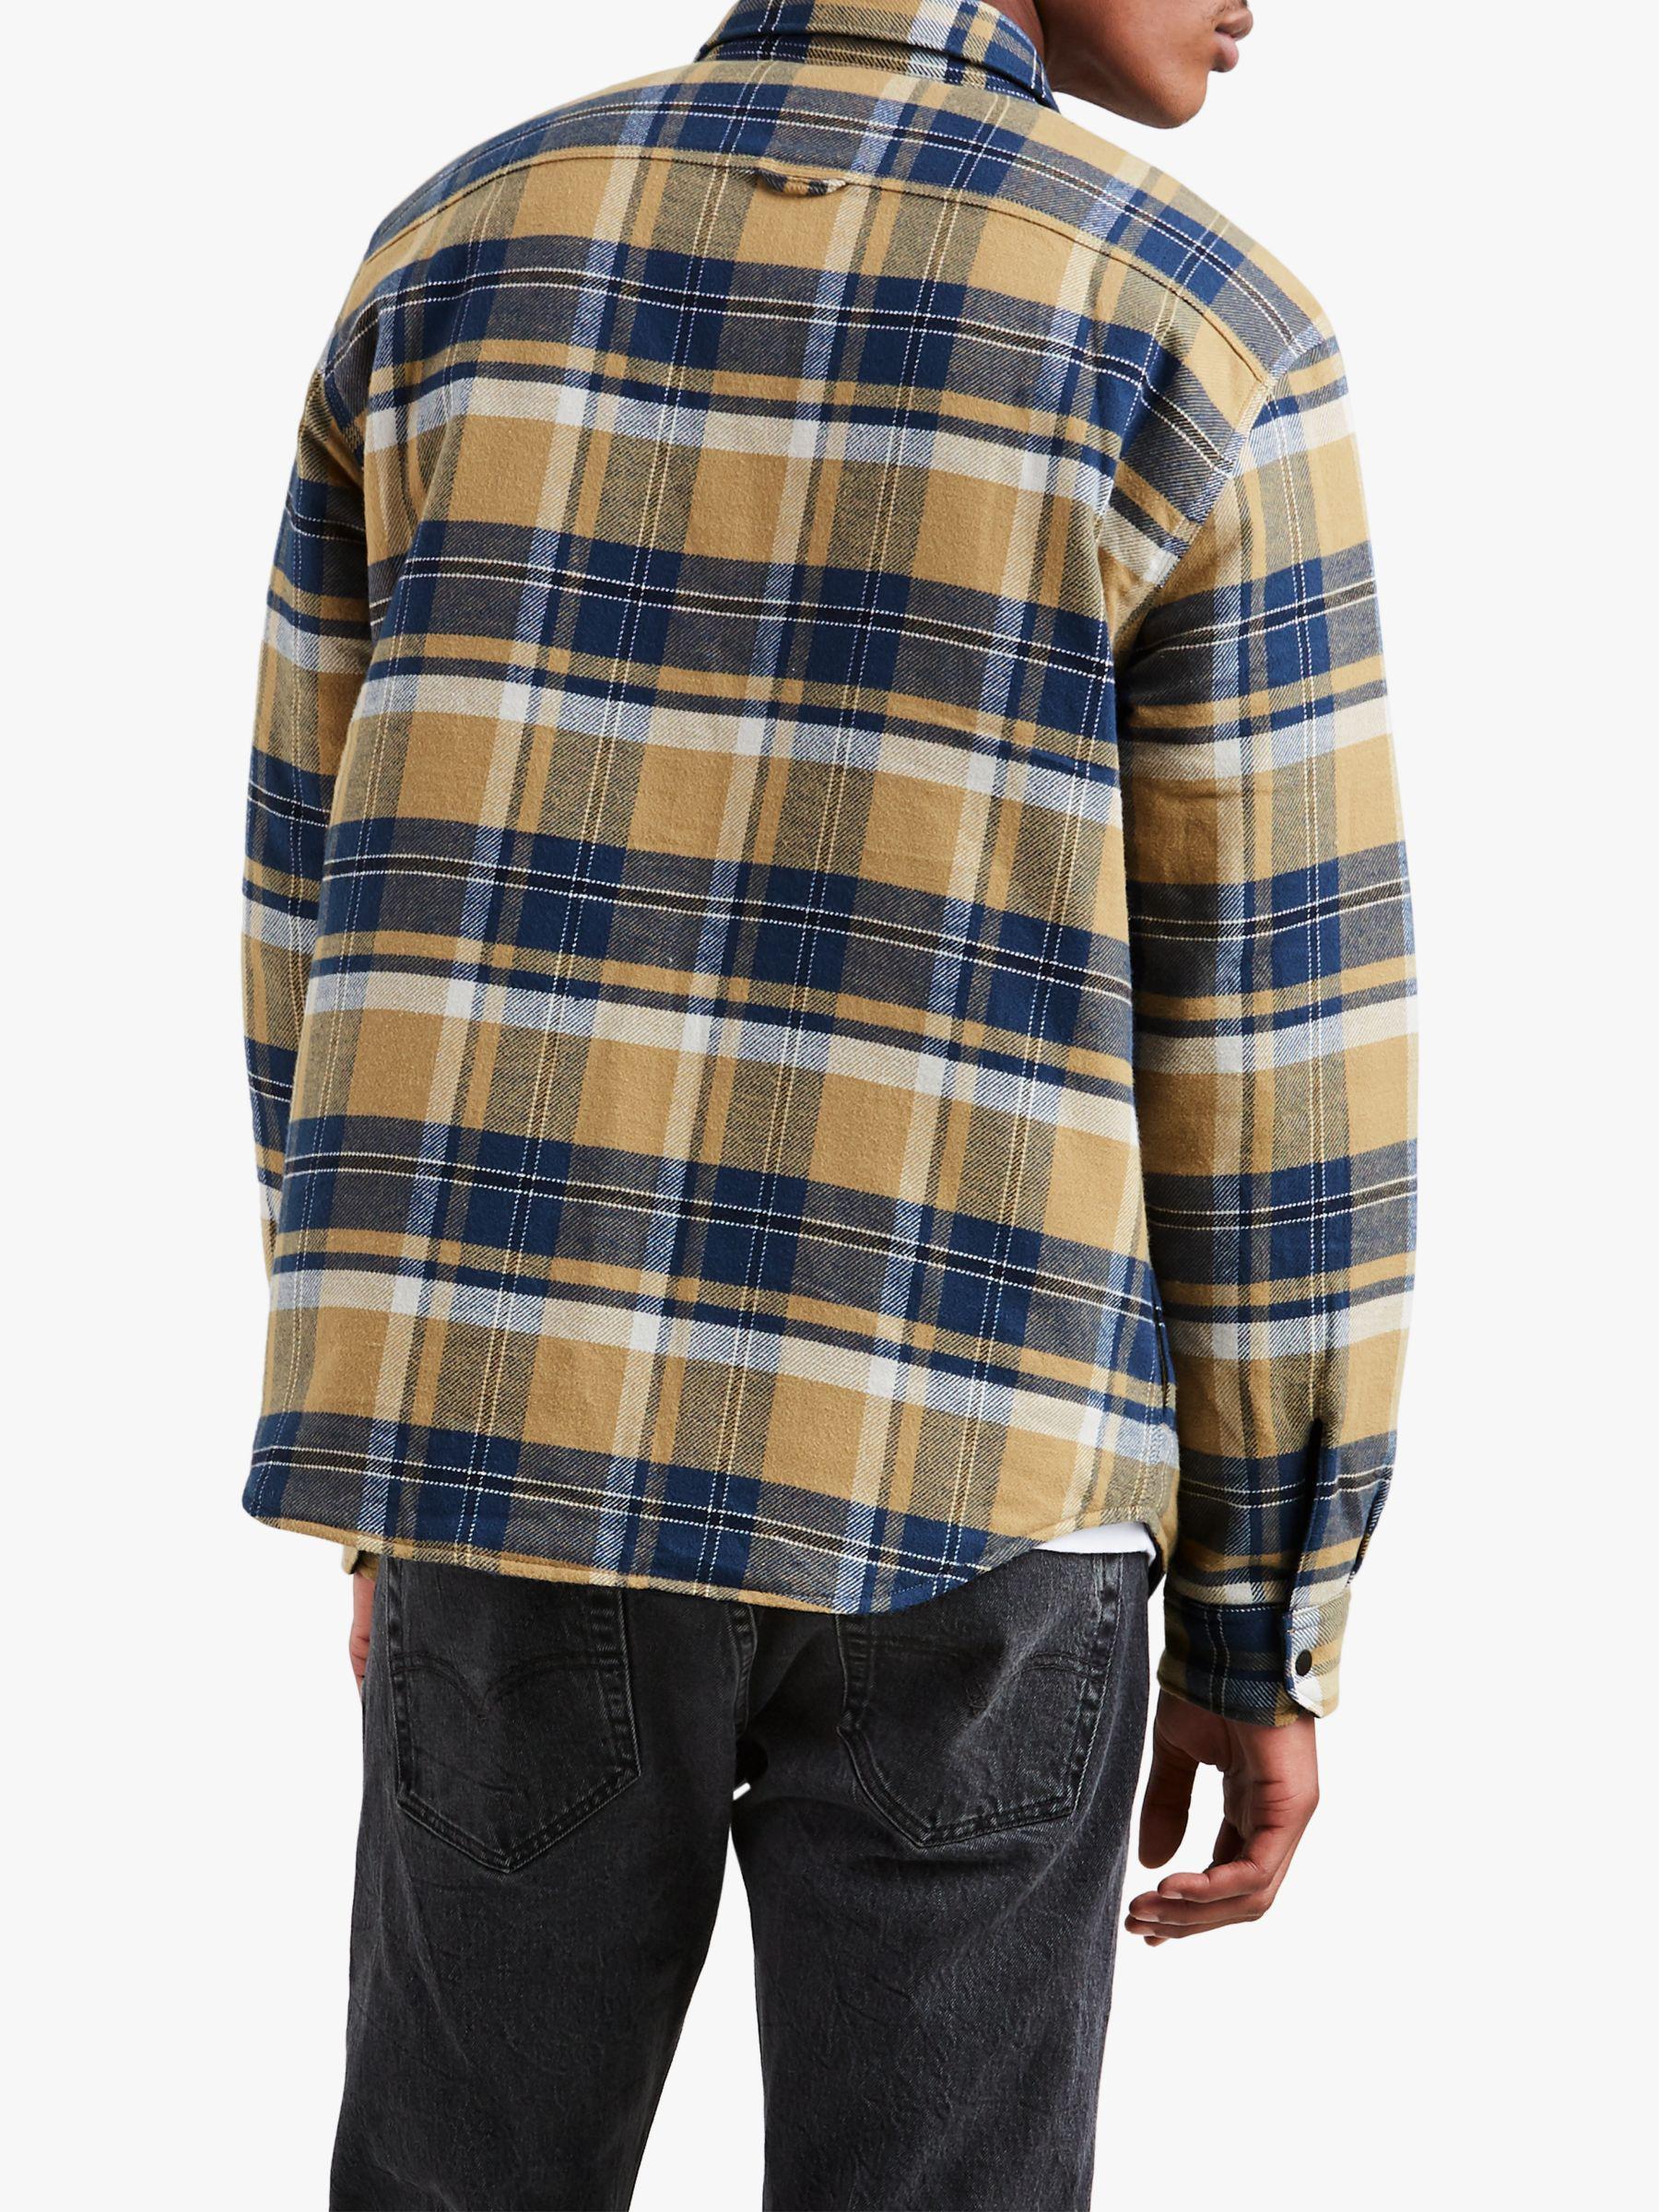 Levi S Flannel X Justin Timberlake Reversible Shirt Jacket